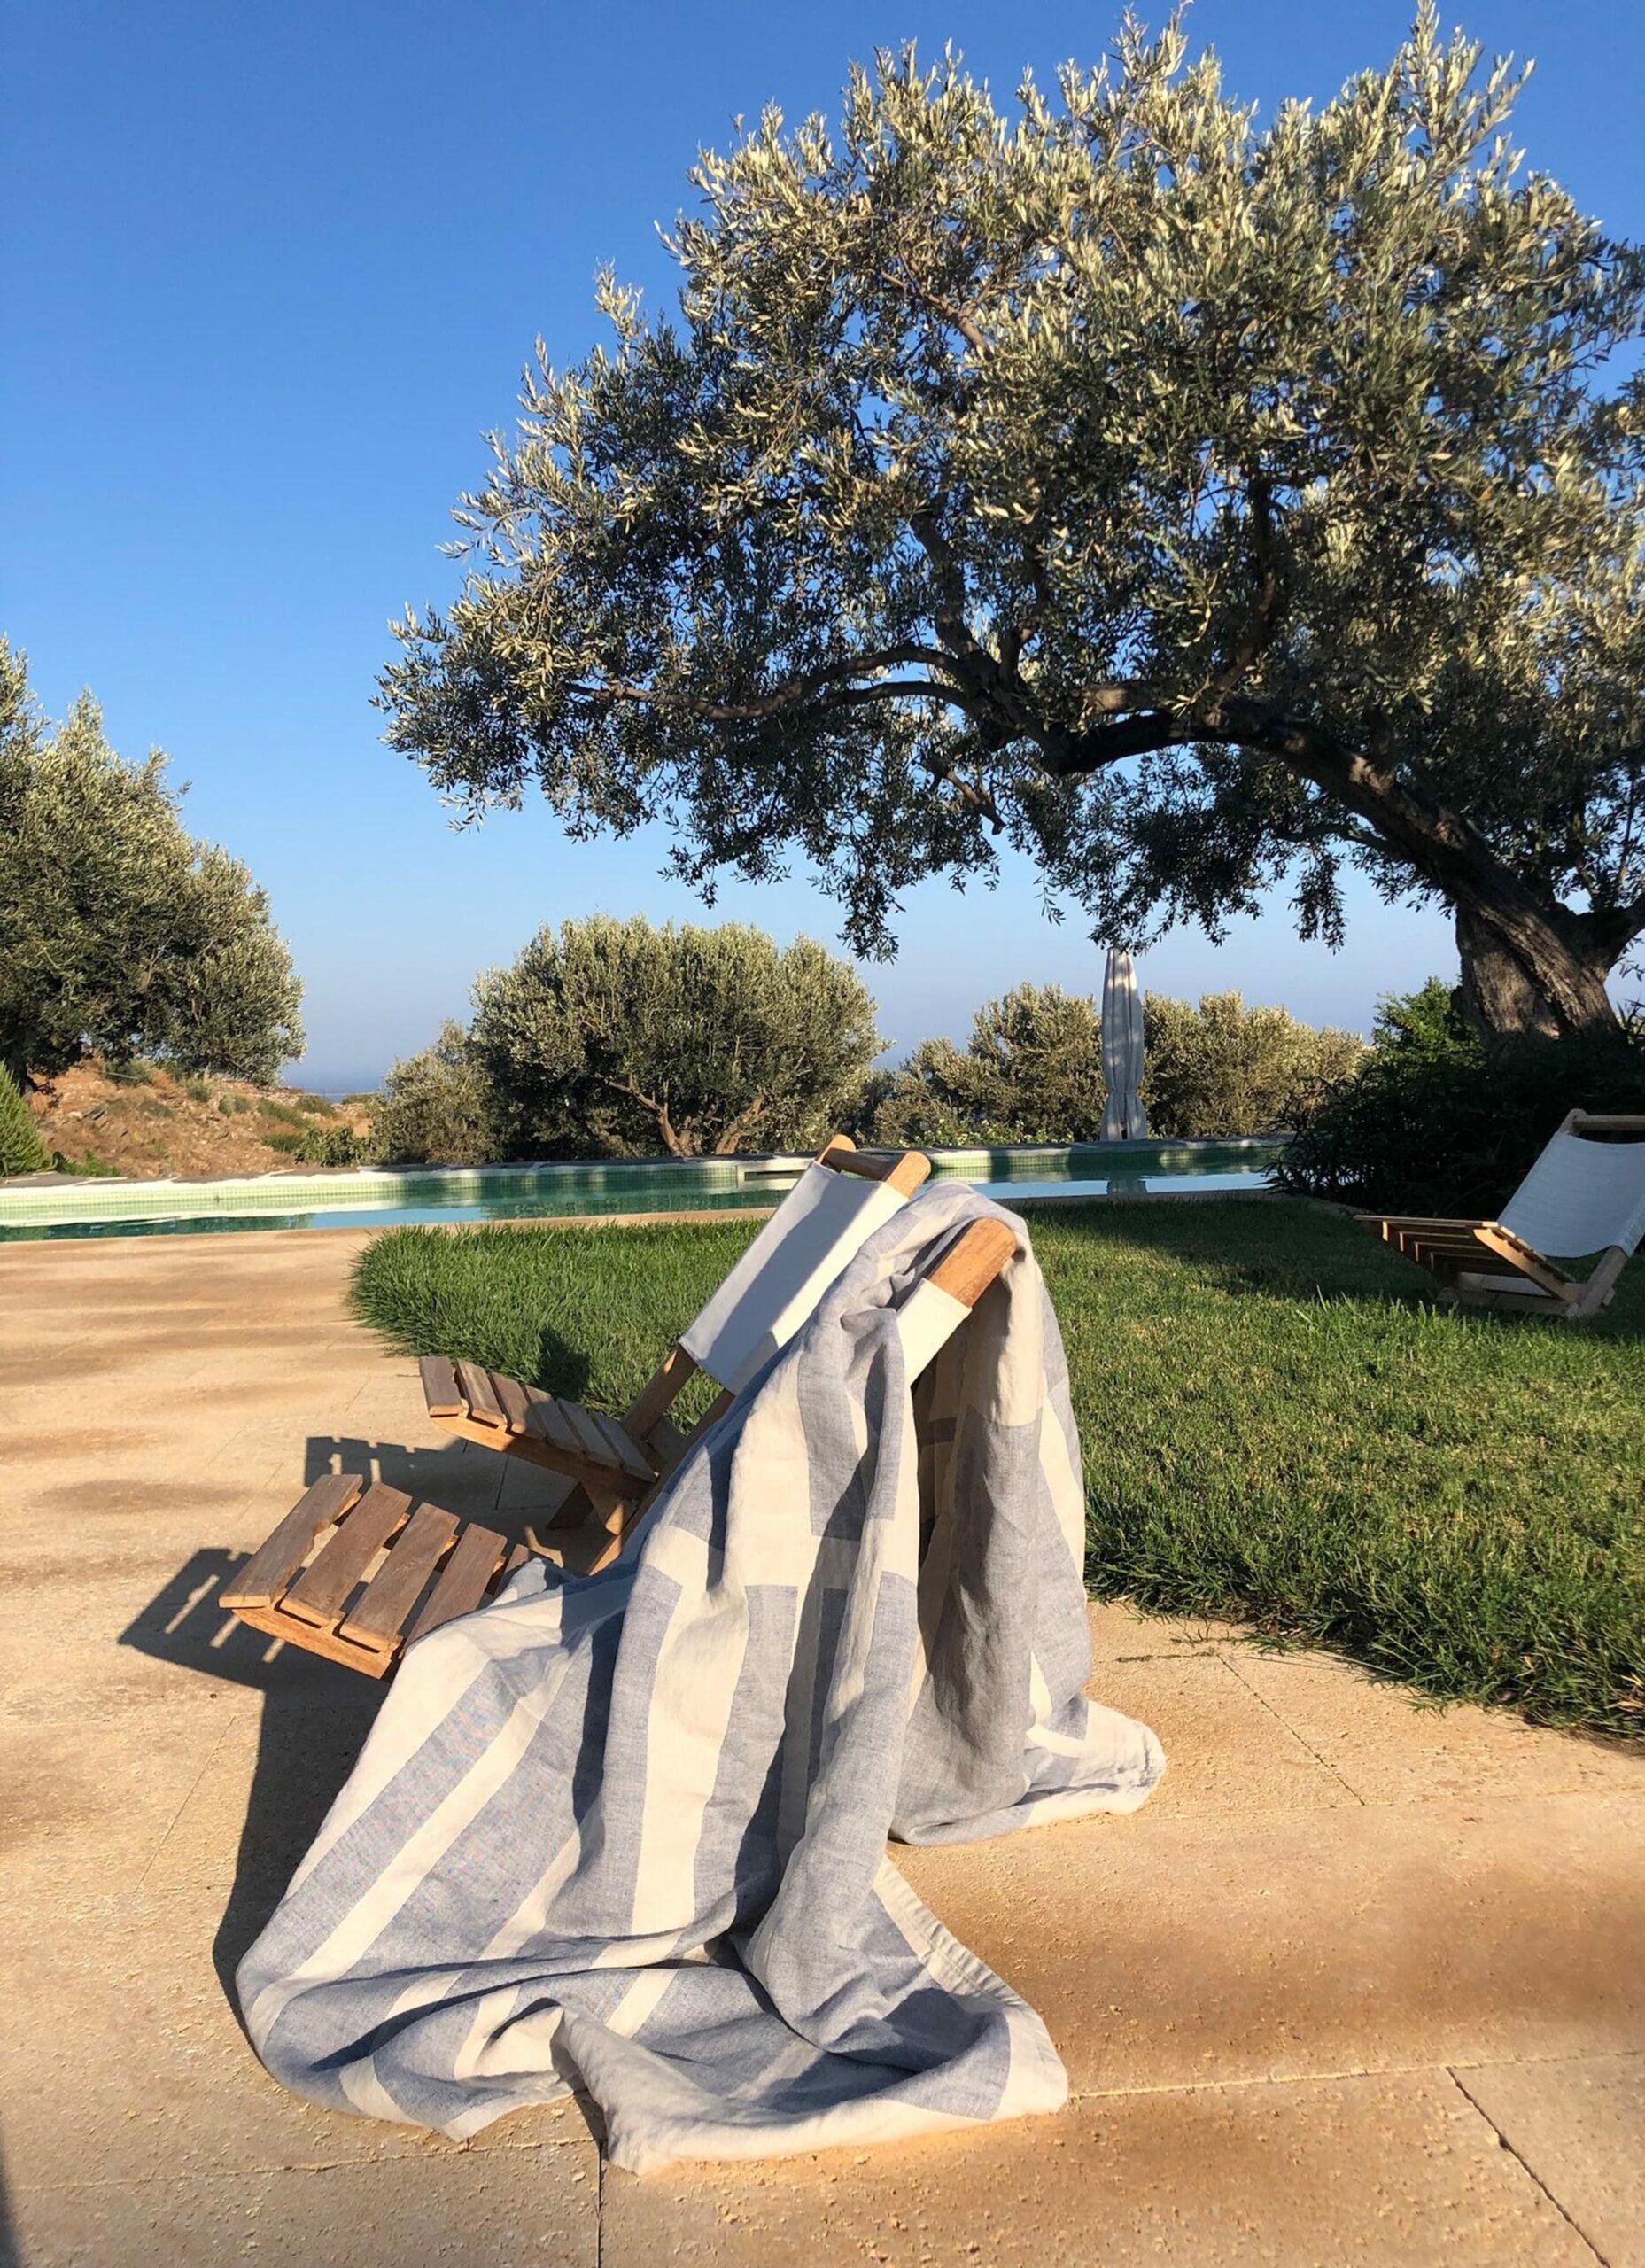 Nimu - Roma - Ischia Beach Towel - Soft linen and Cotton-jacquard - 170x135cm